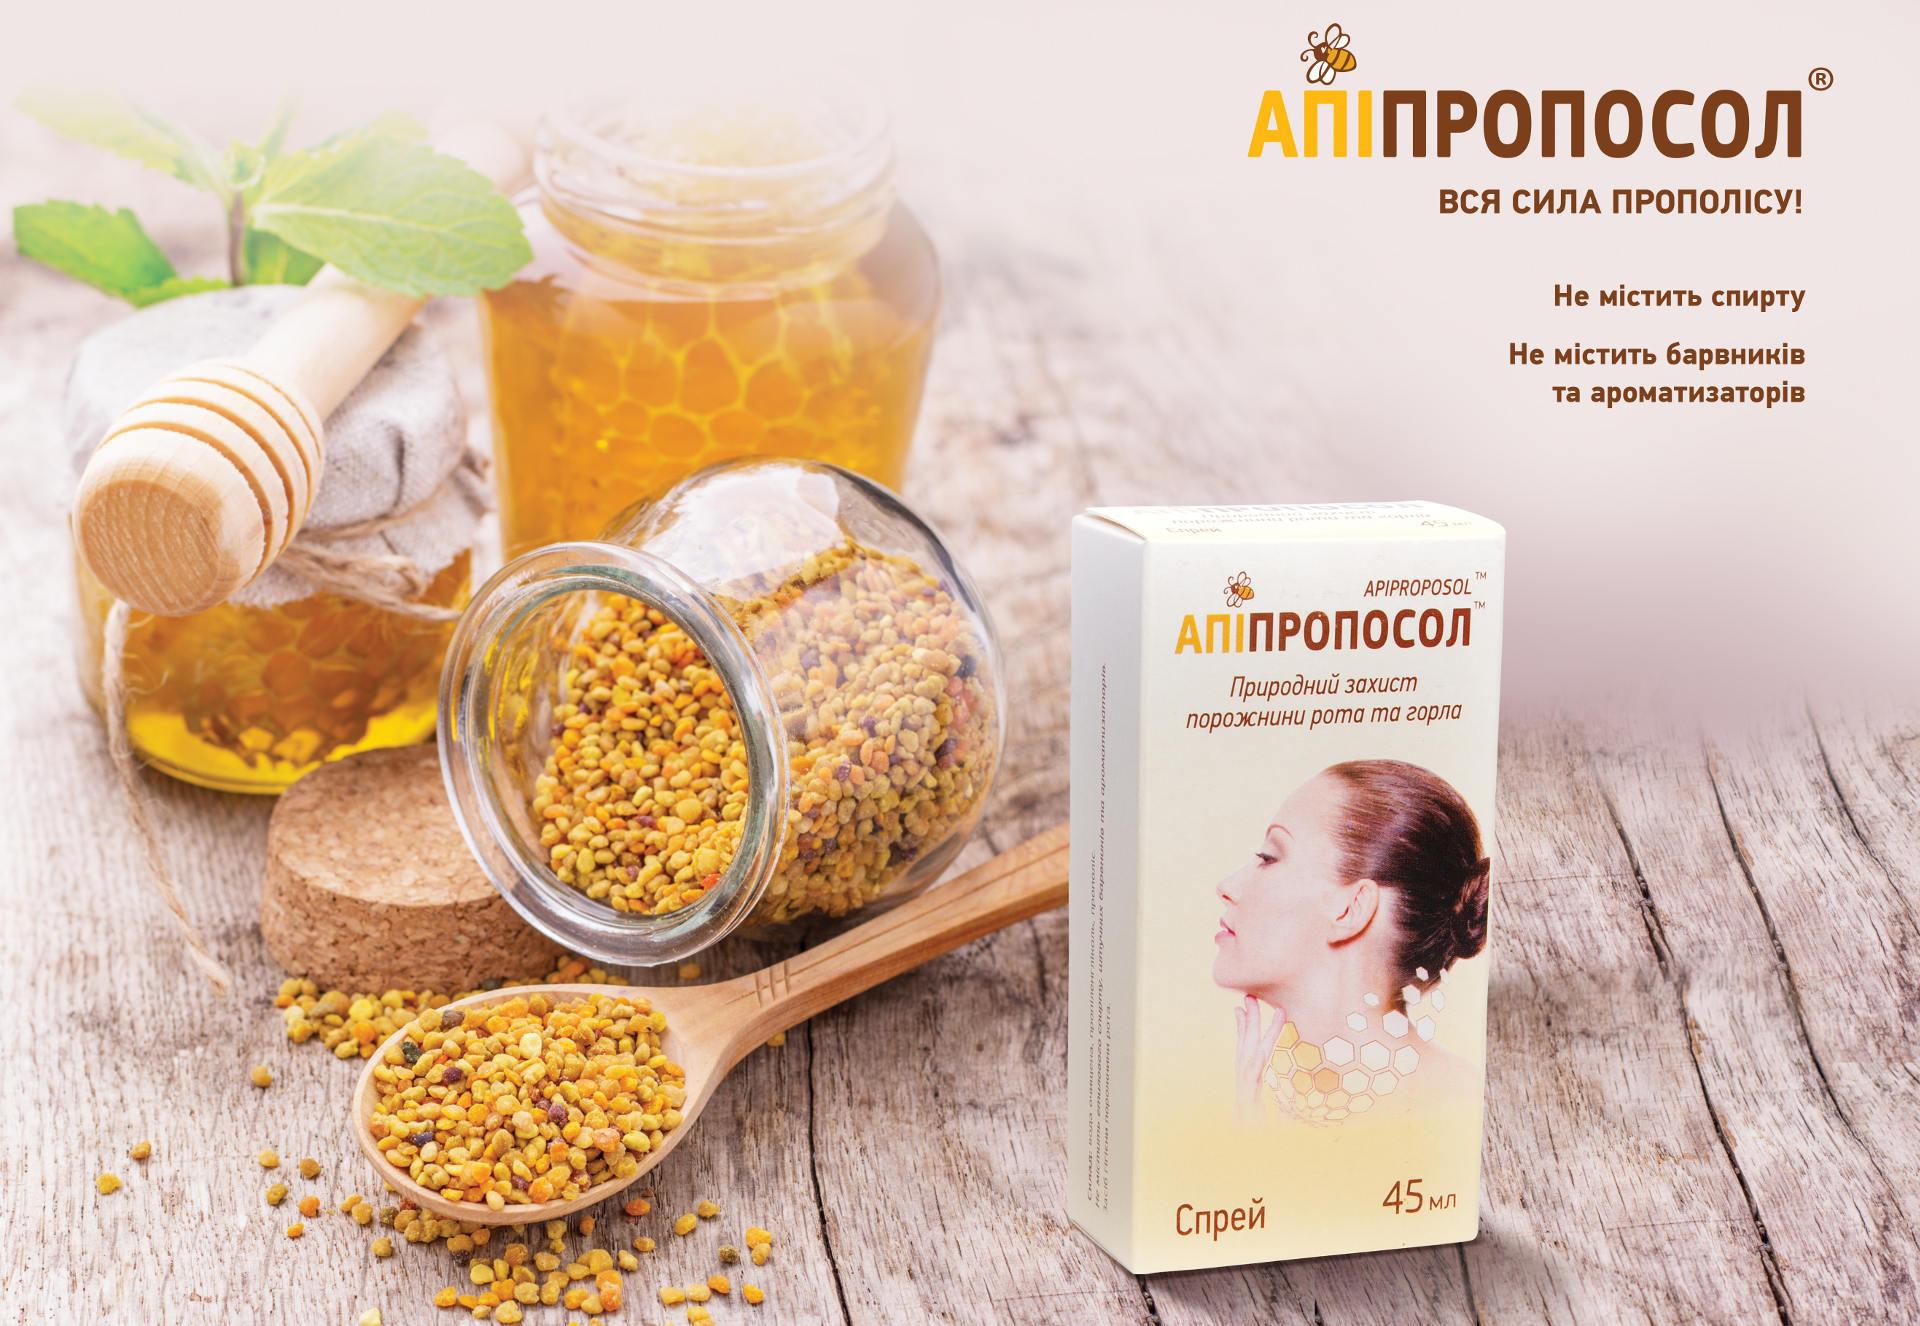 Дизайн упаковки медицинского препарата Апипропосол